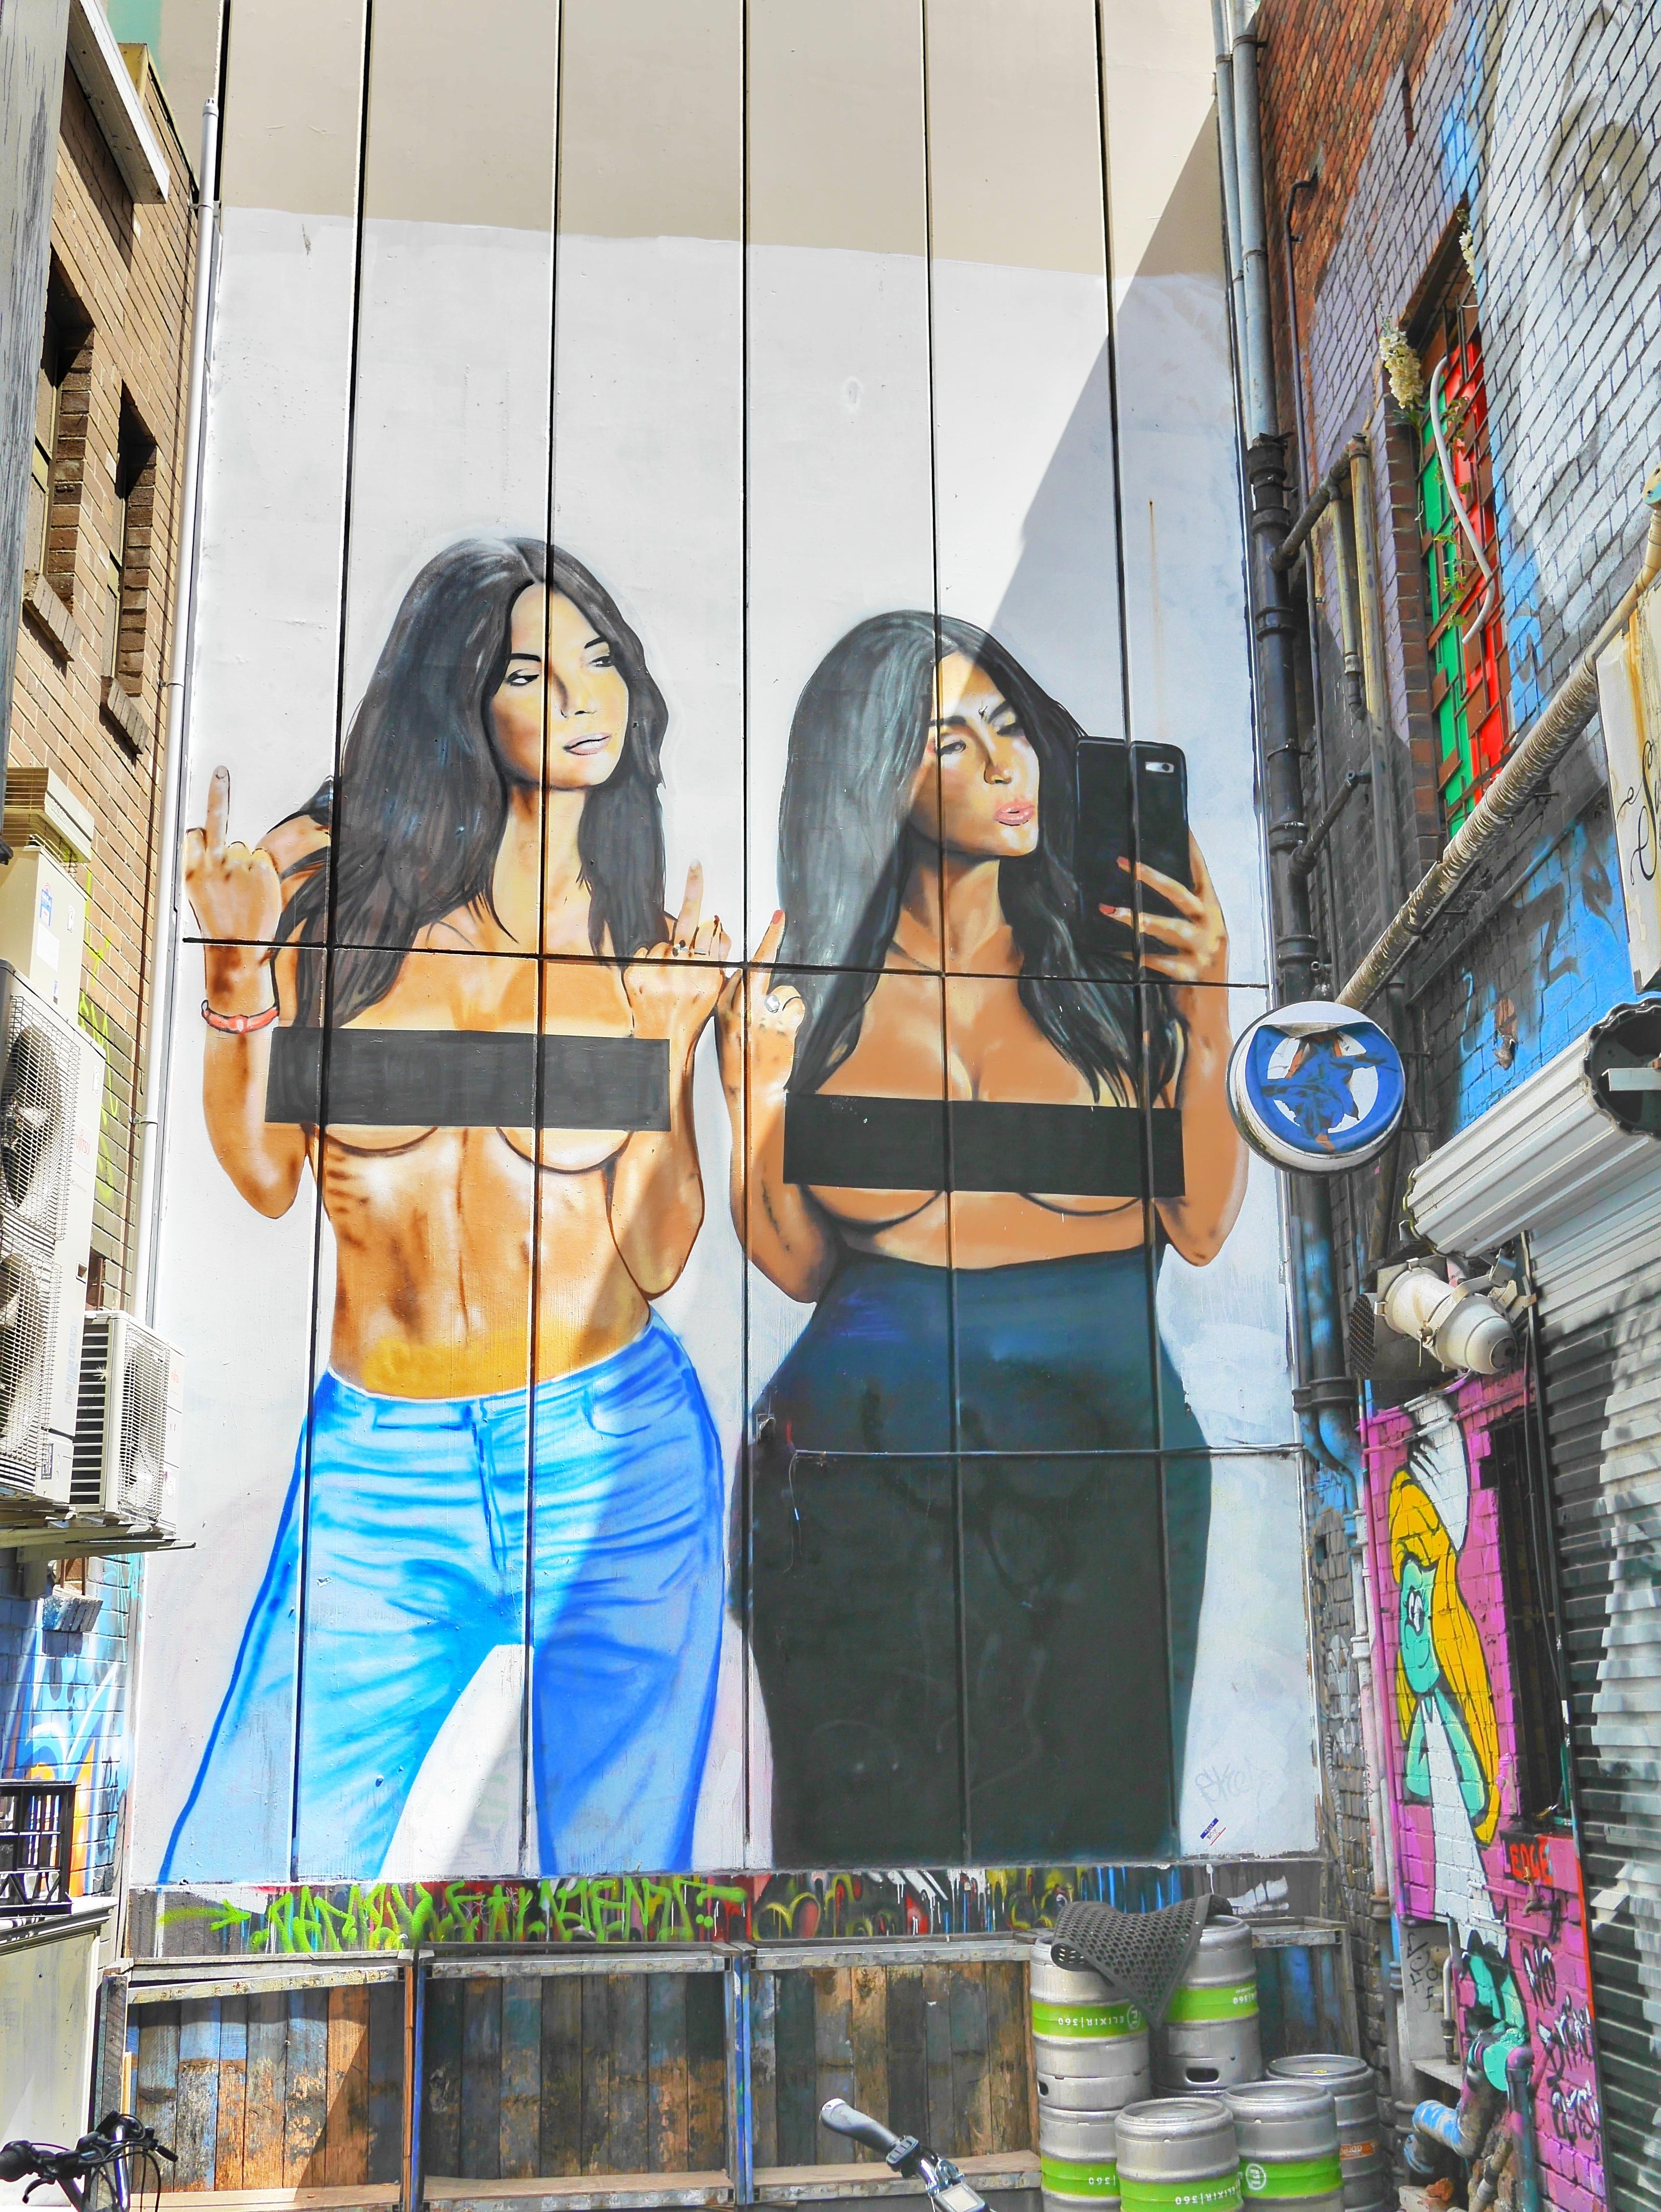 Kim K Graffiti Melbourne